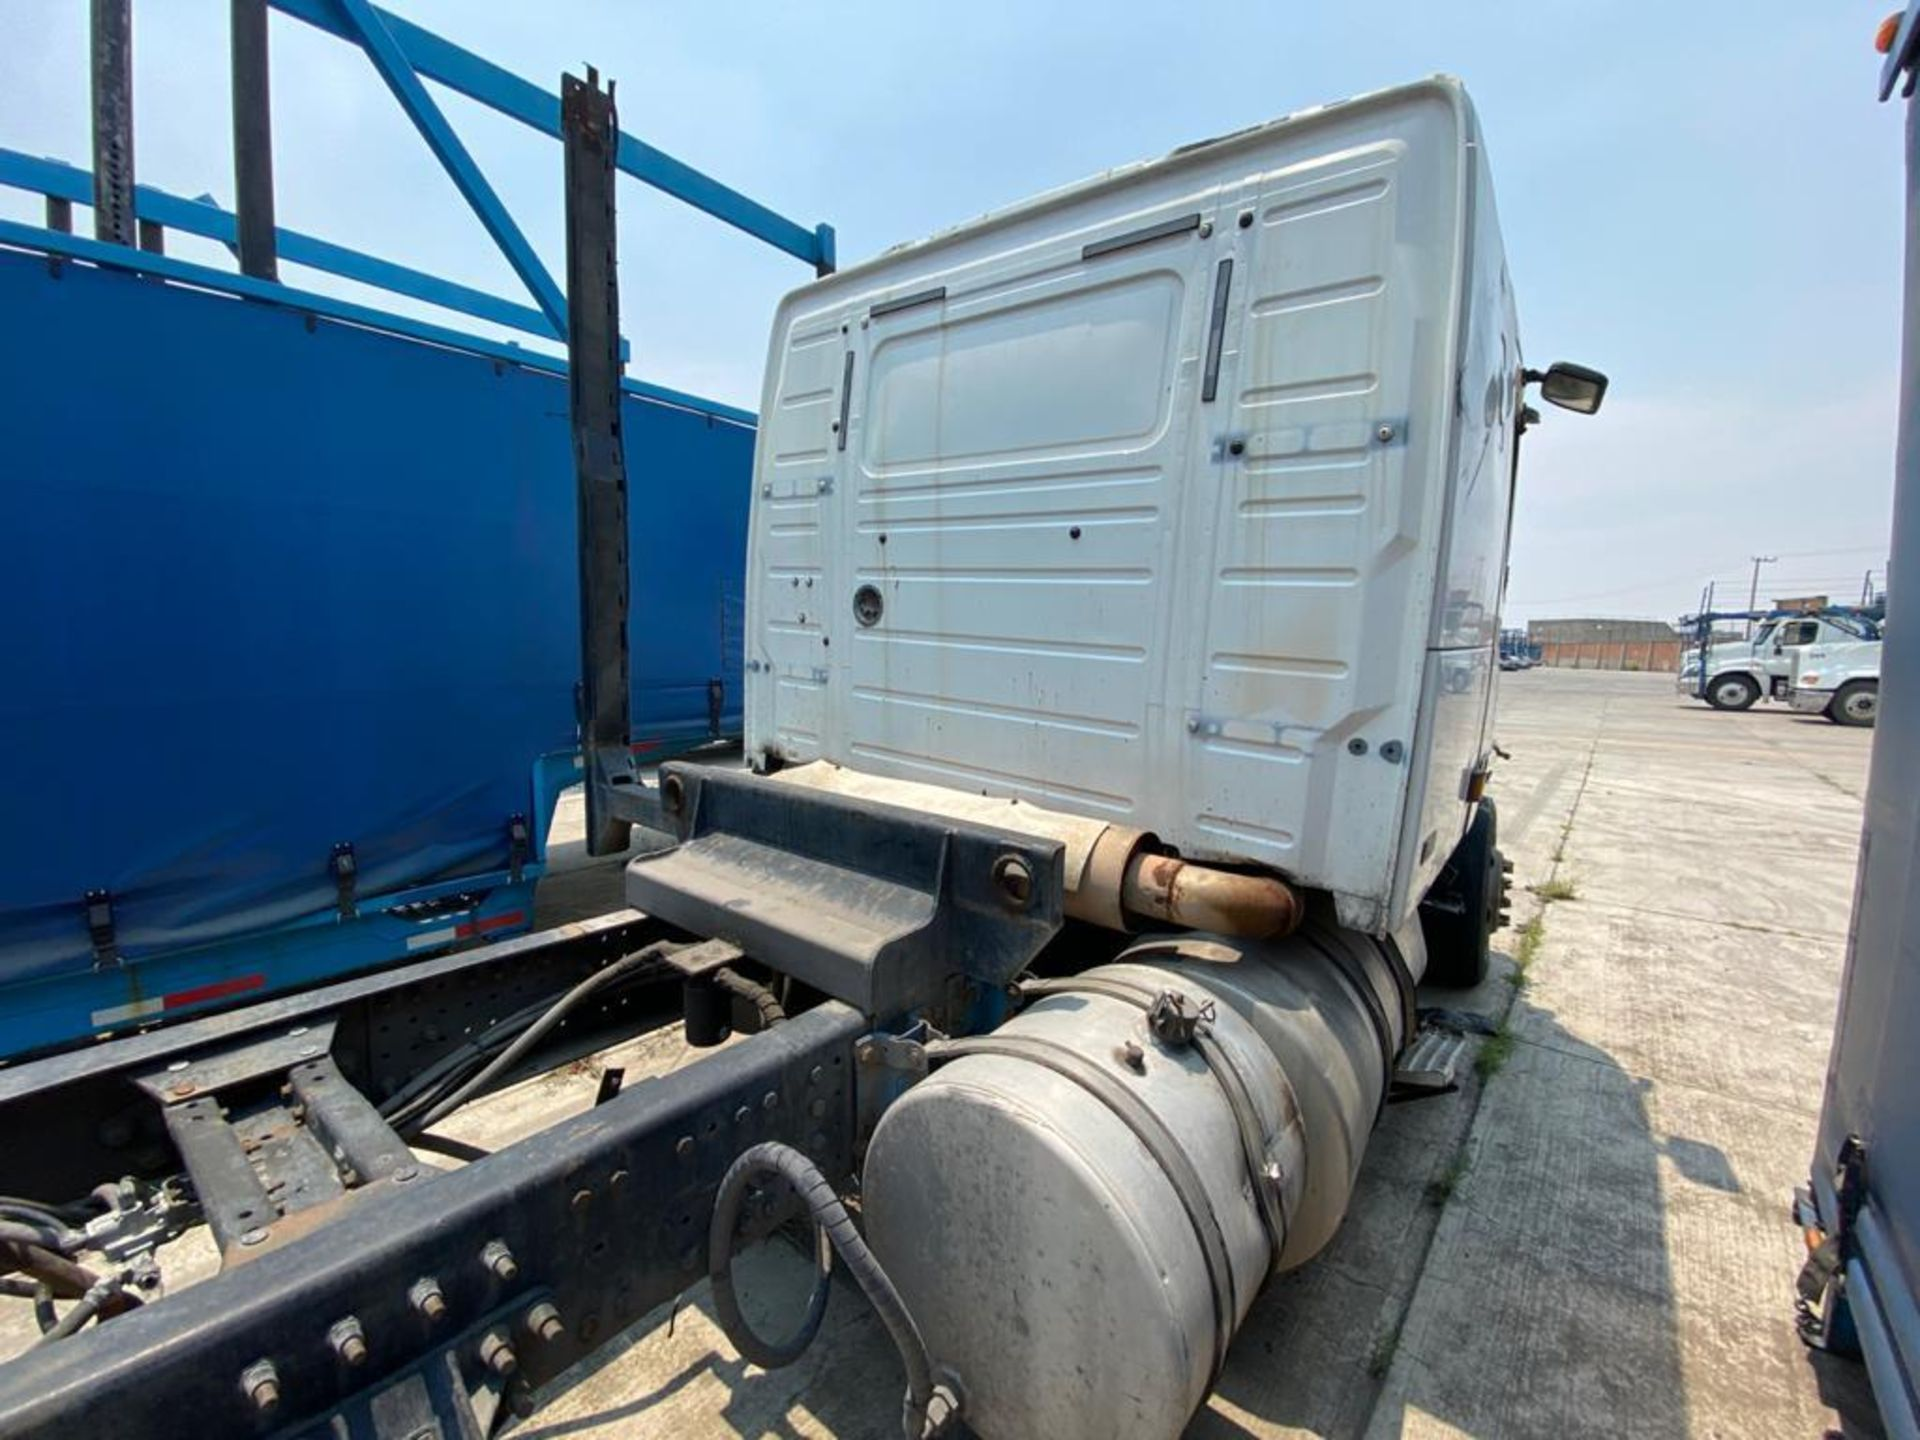 2001 Volvo Sleeper Truck Tractor, estándar transmissión of 18 speeds, with Volvo motor - Image 27 of 60